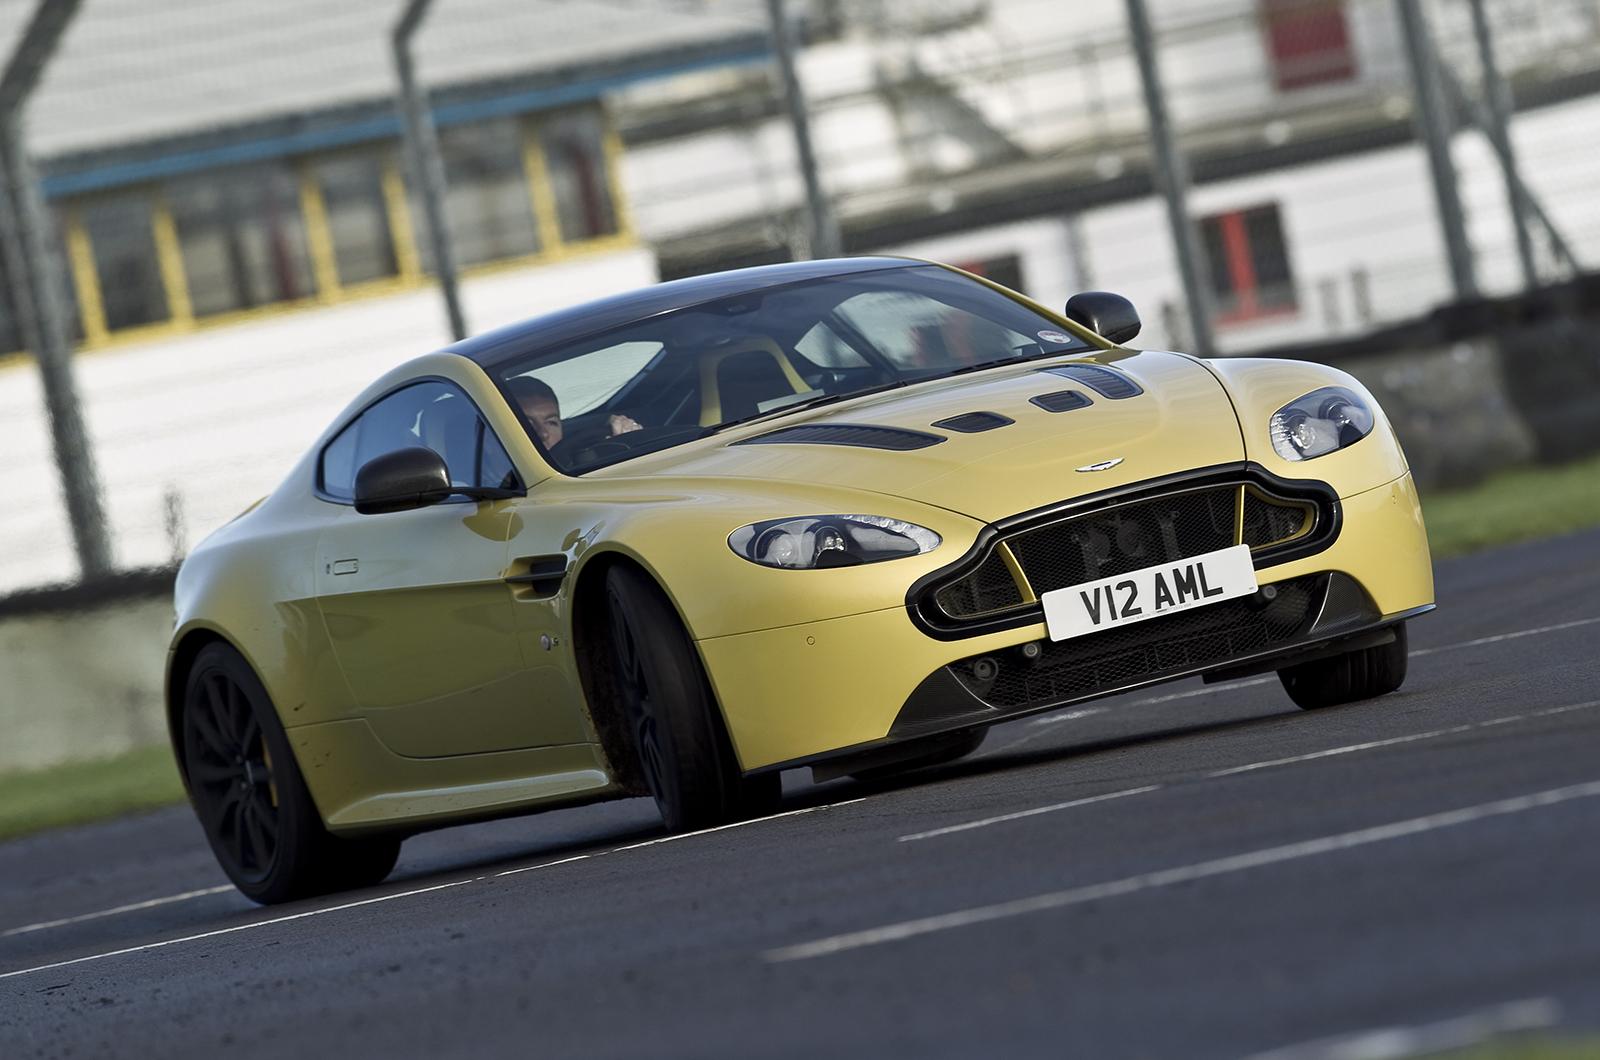 Aston Martin V Vantage S Review Autocar - Aston martin v12 vantage s price